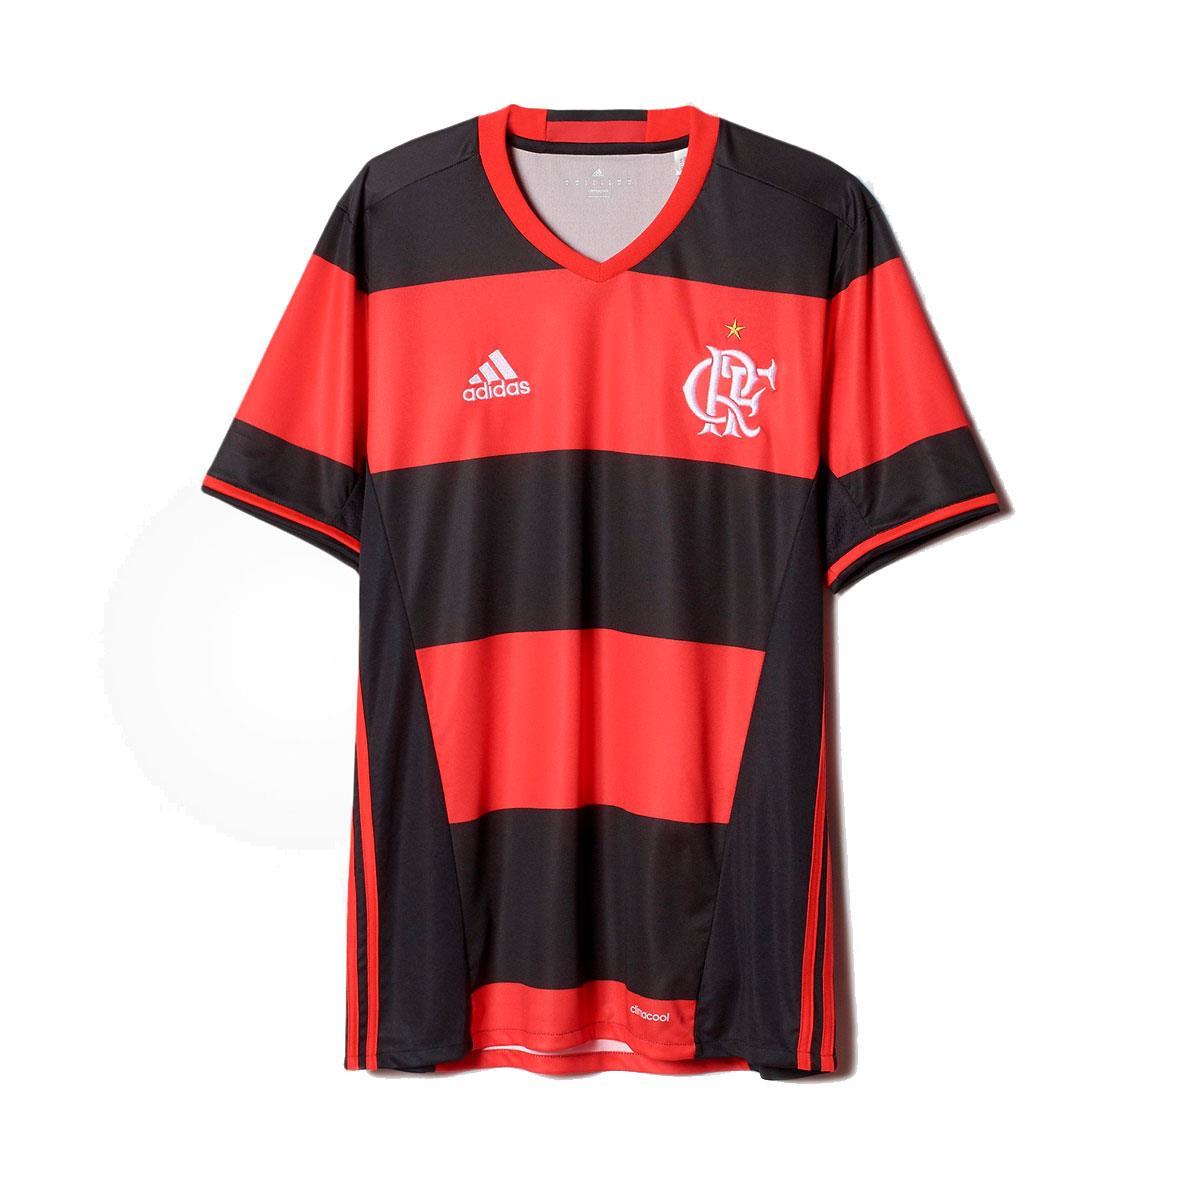 844c528c712 Camisa Adidas Flamengo I 2017 2018 Torcedor Masculina